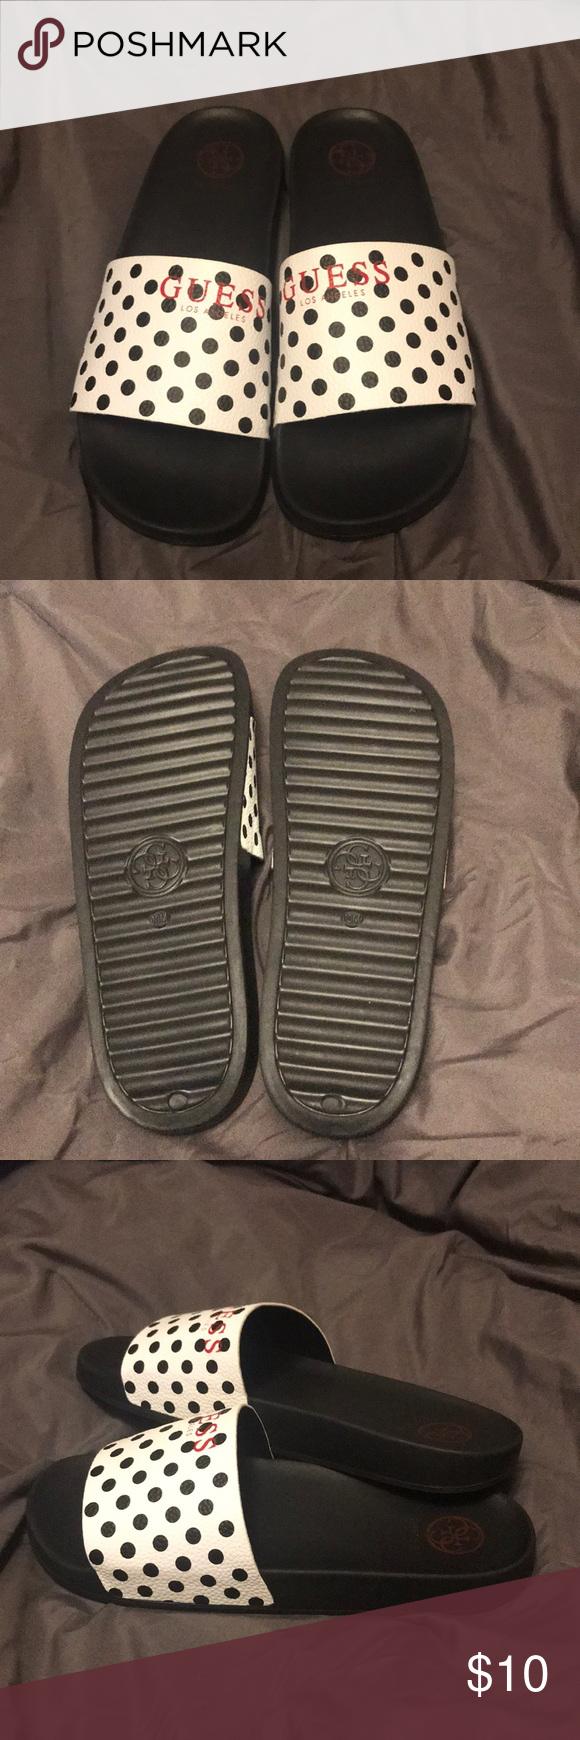 f6a63933024c NWOT guess polka dot slides Cute slides! Never worn. Guess Shoes Sandals